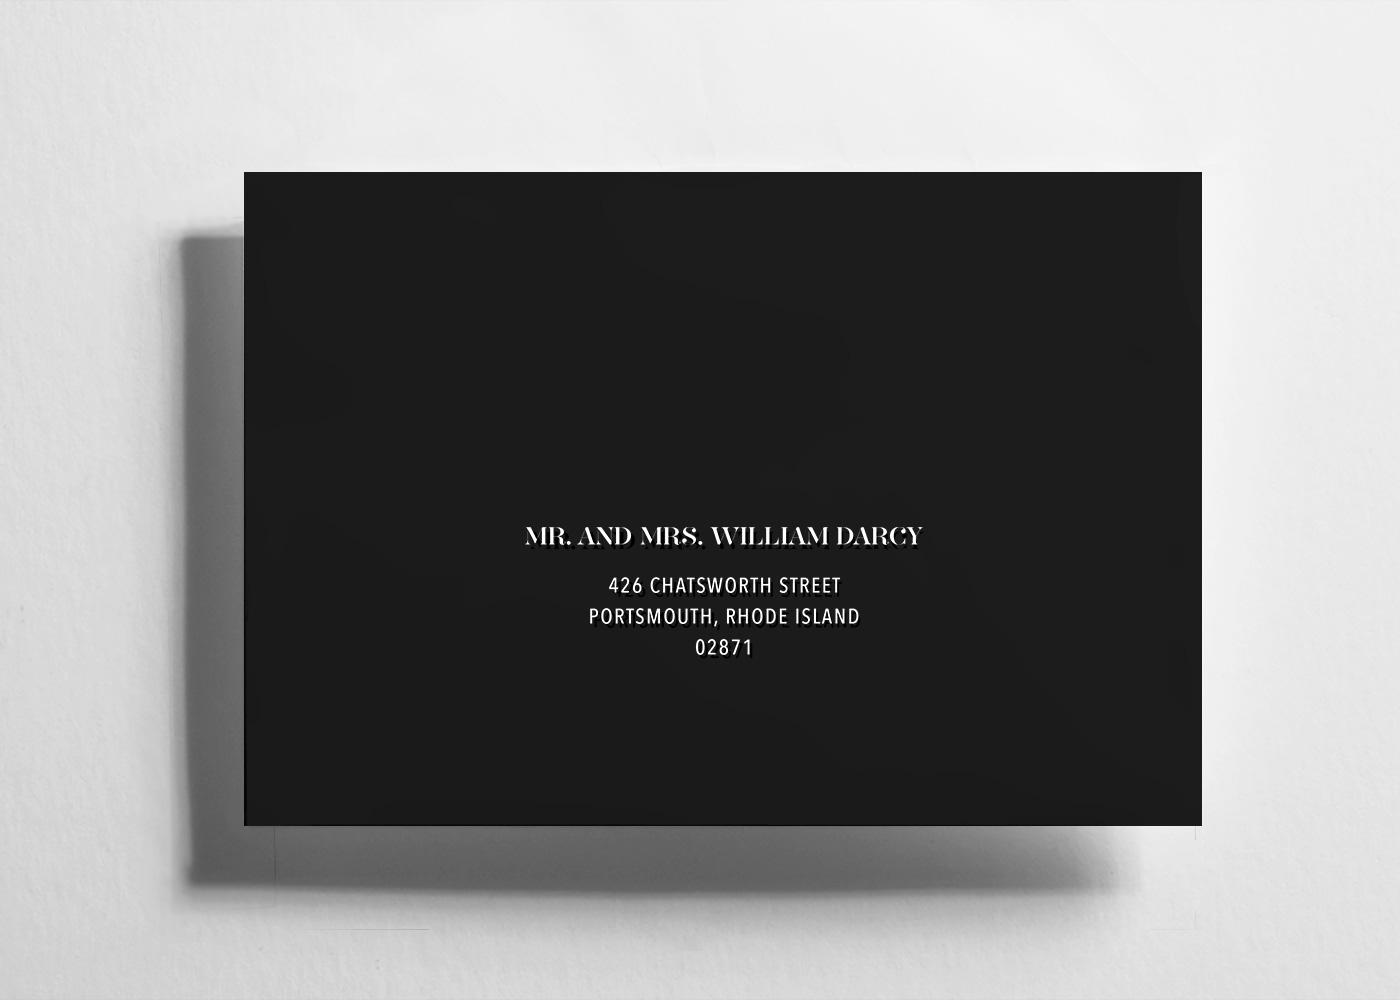 LoveLore_Envelope-Printing_SP18_ParadiseFound_White-Ink.jpg